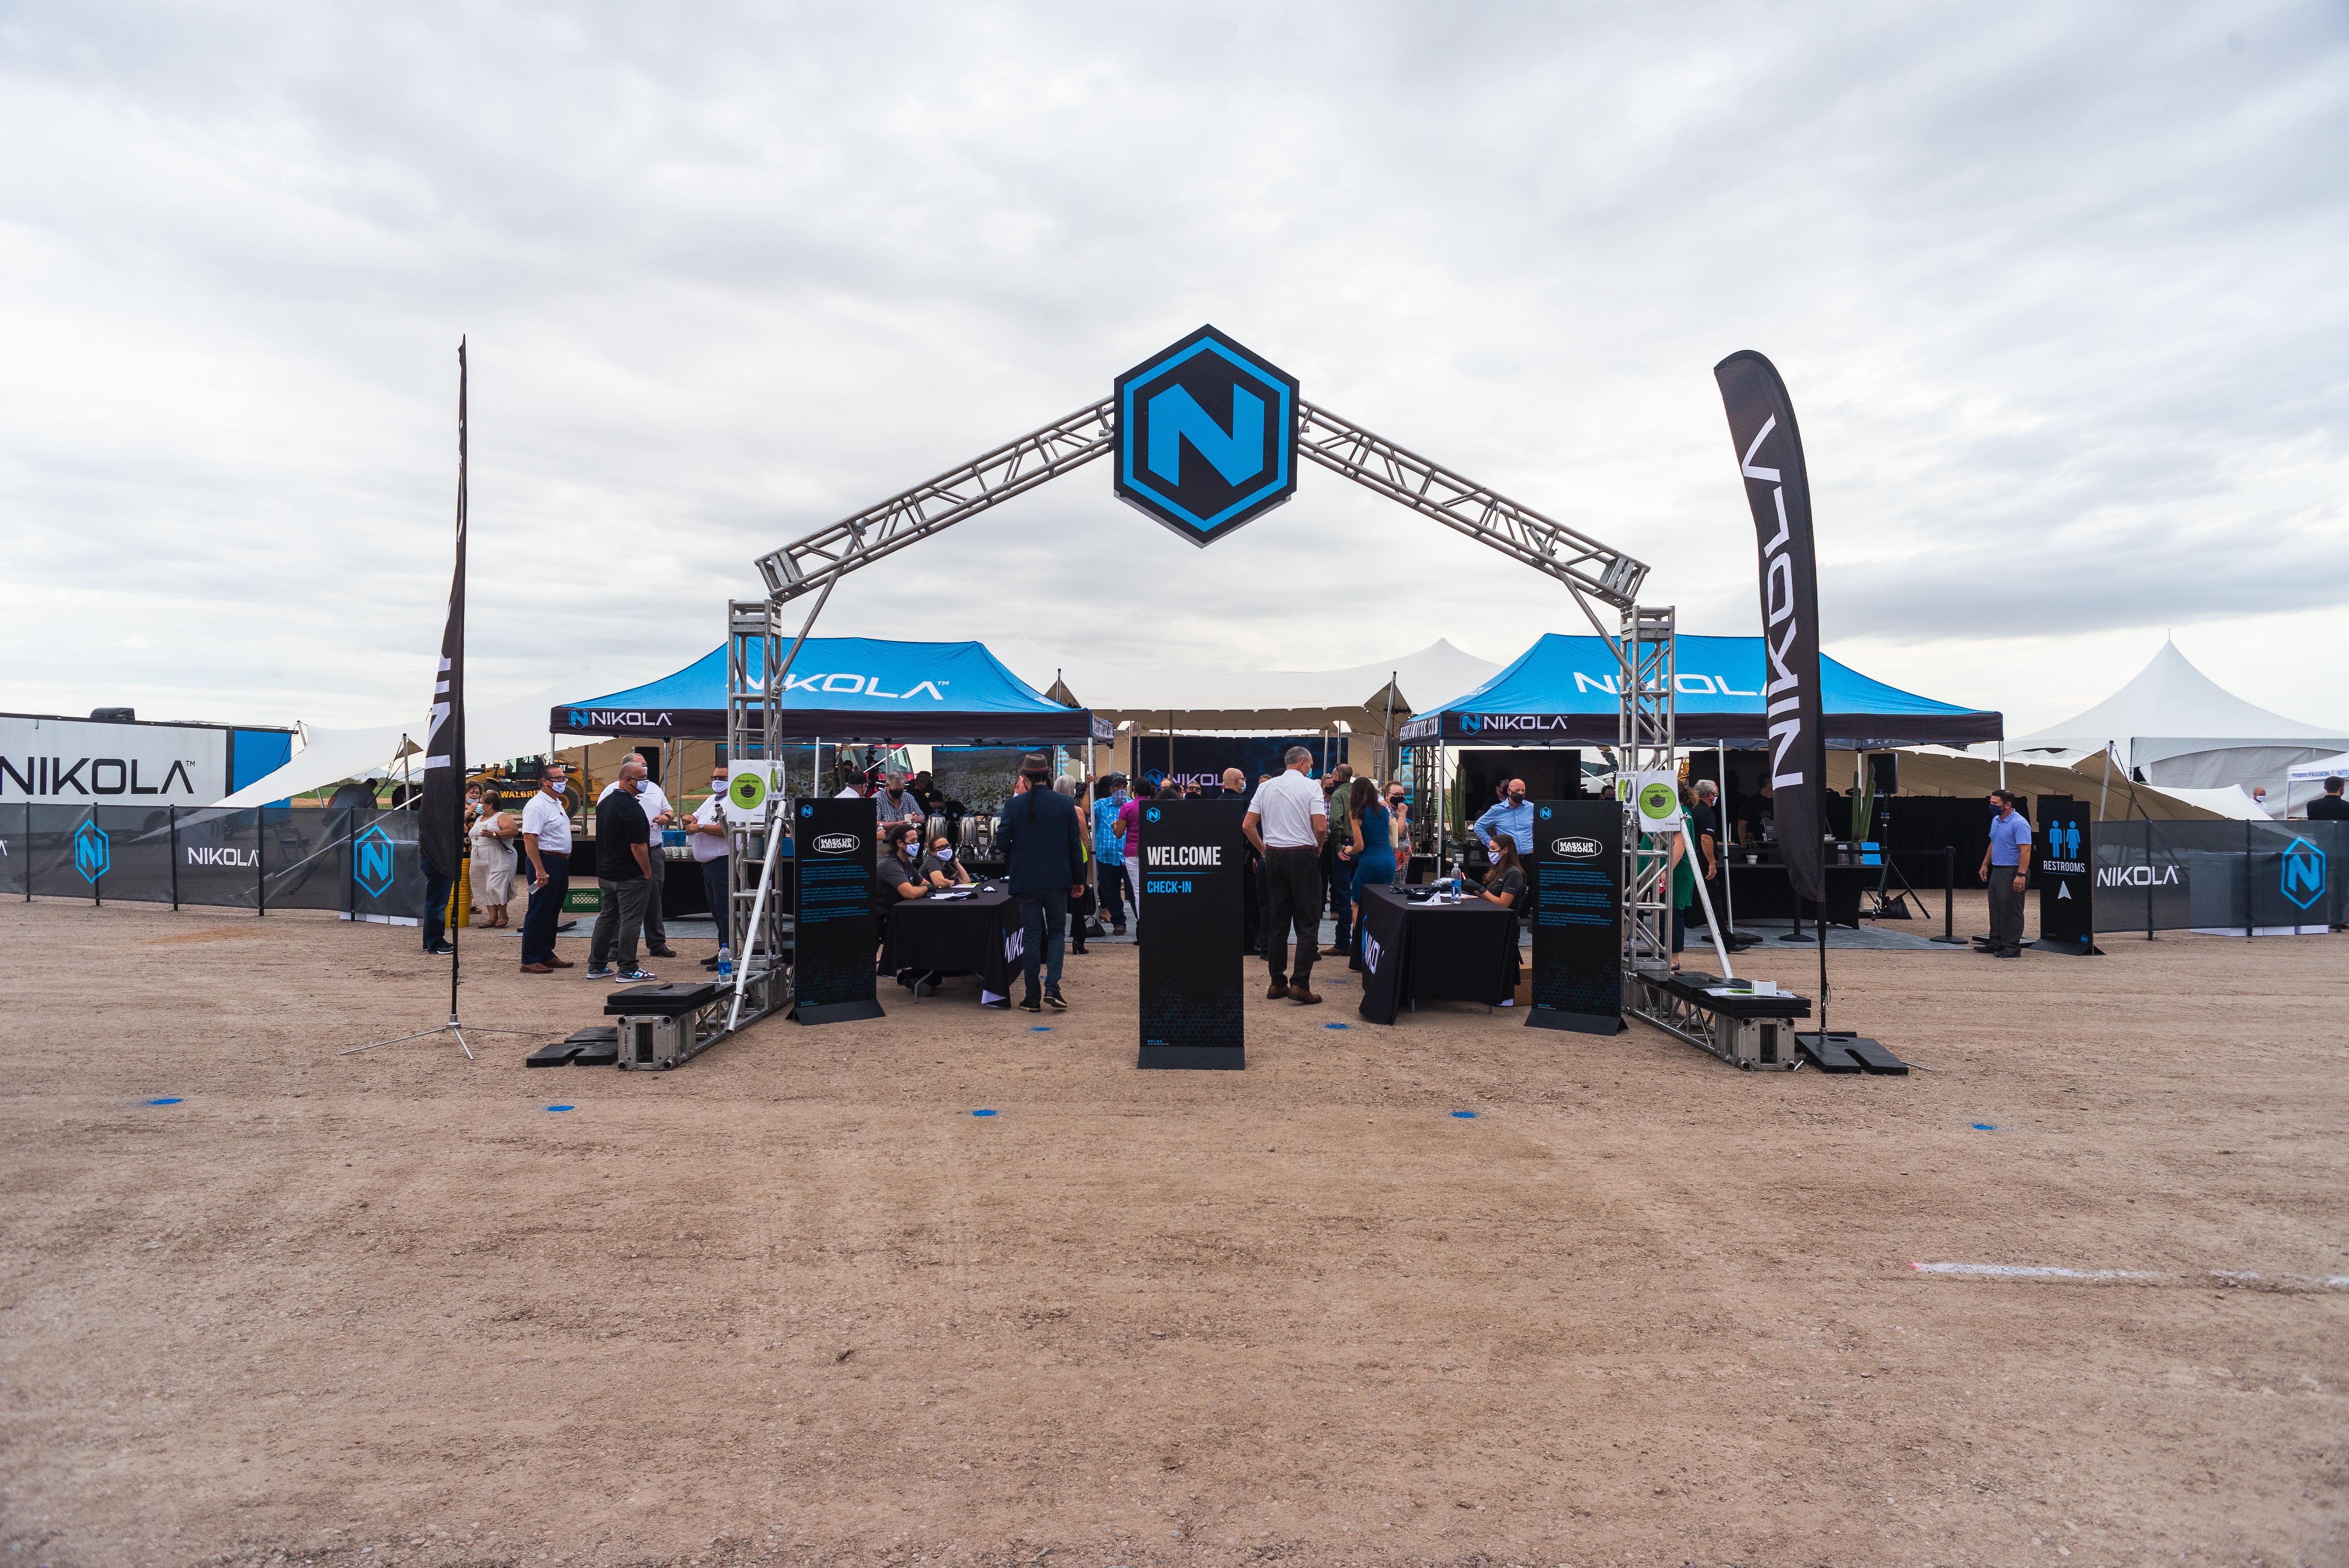 Nikola ground breaking event press release 2